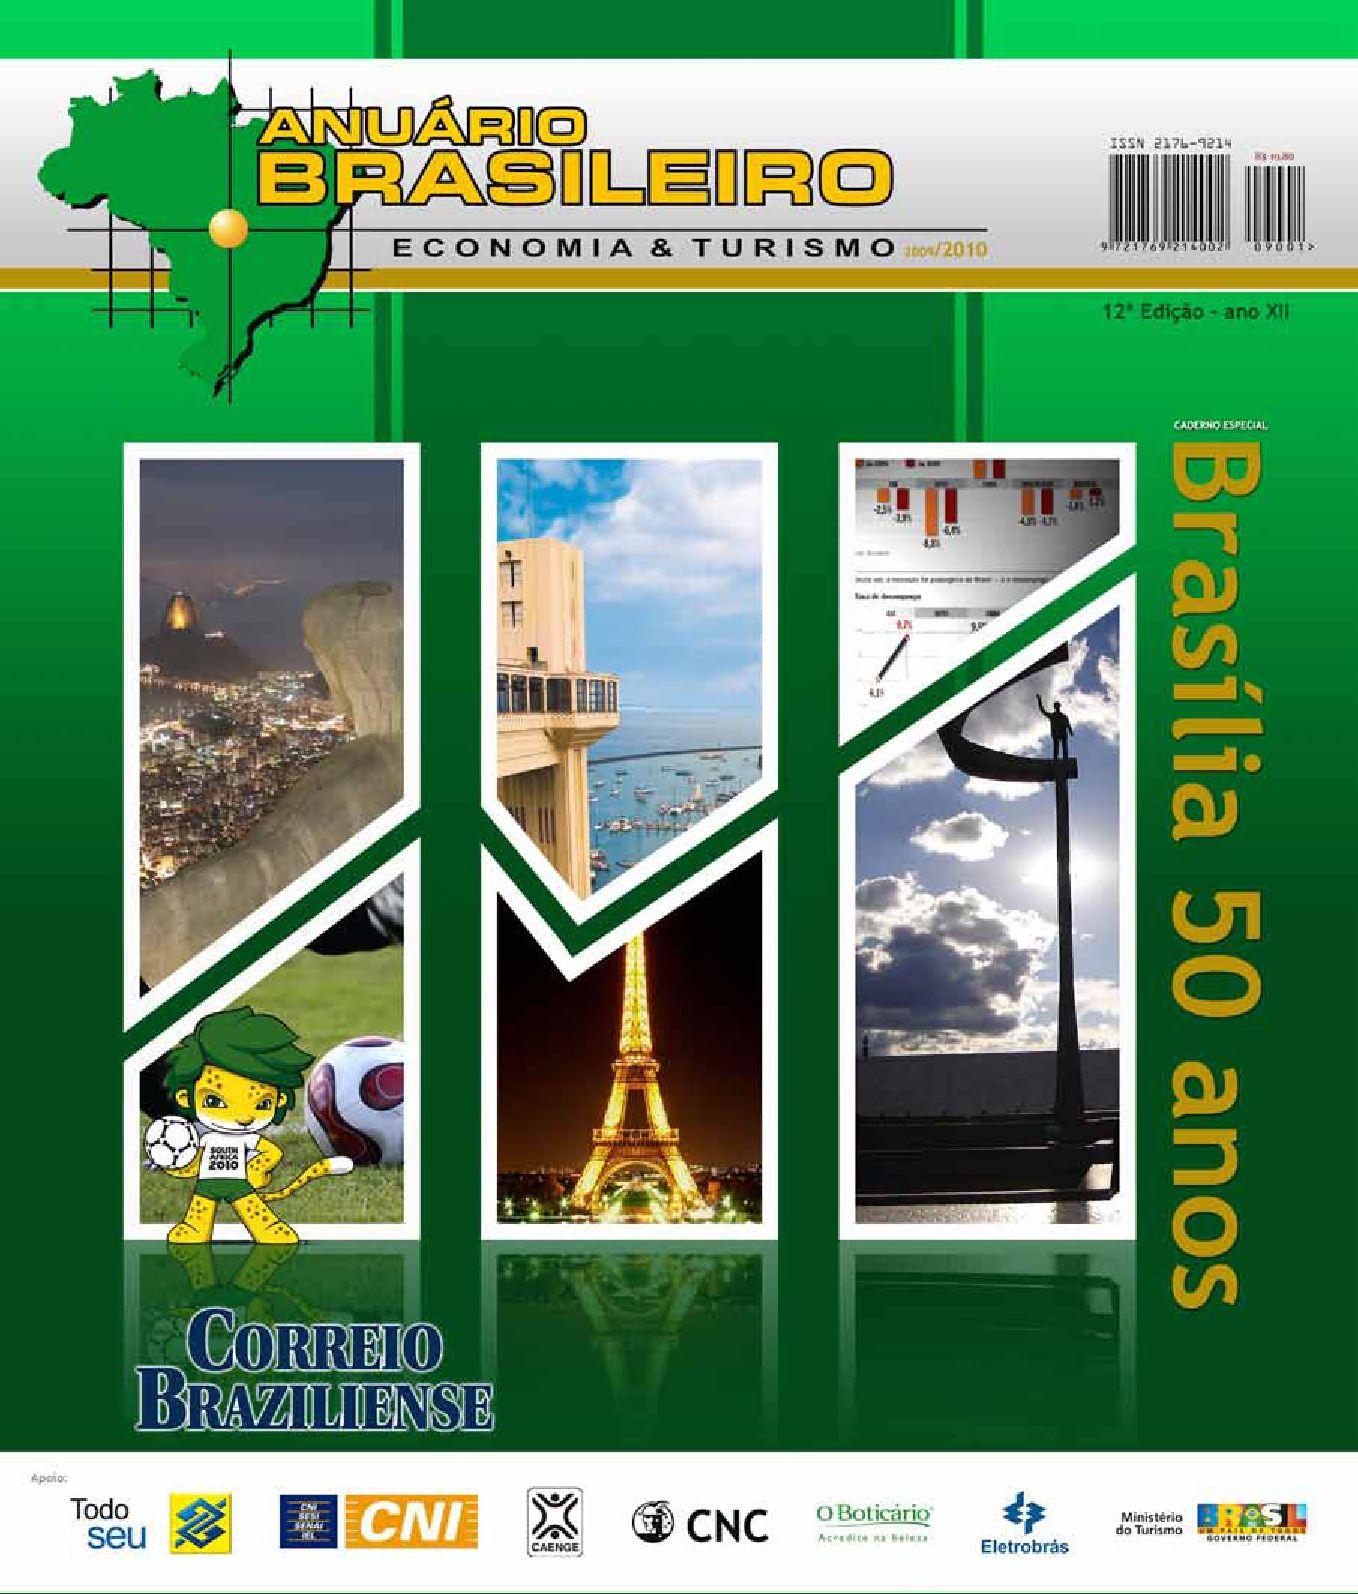 a9bba756a4 Anuário Brasileiro by Paulo Fayad - issuu